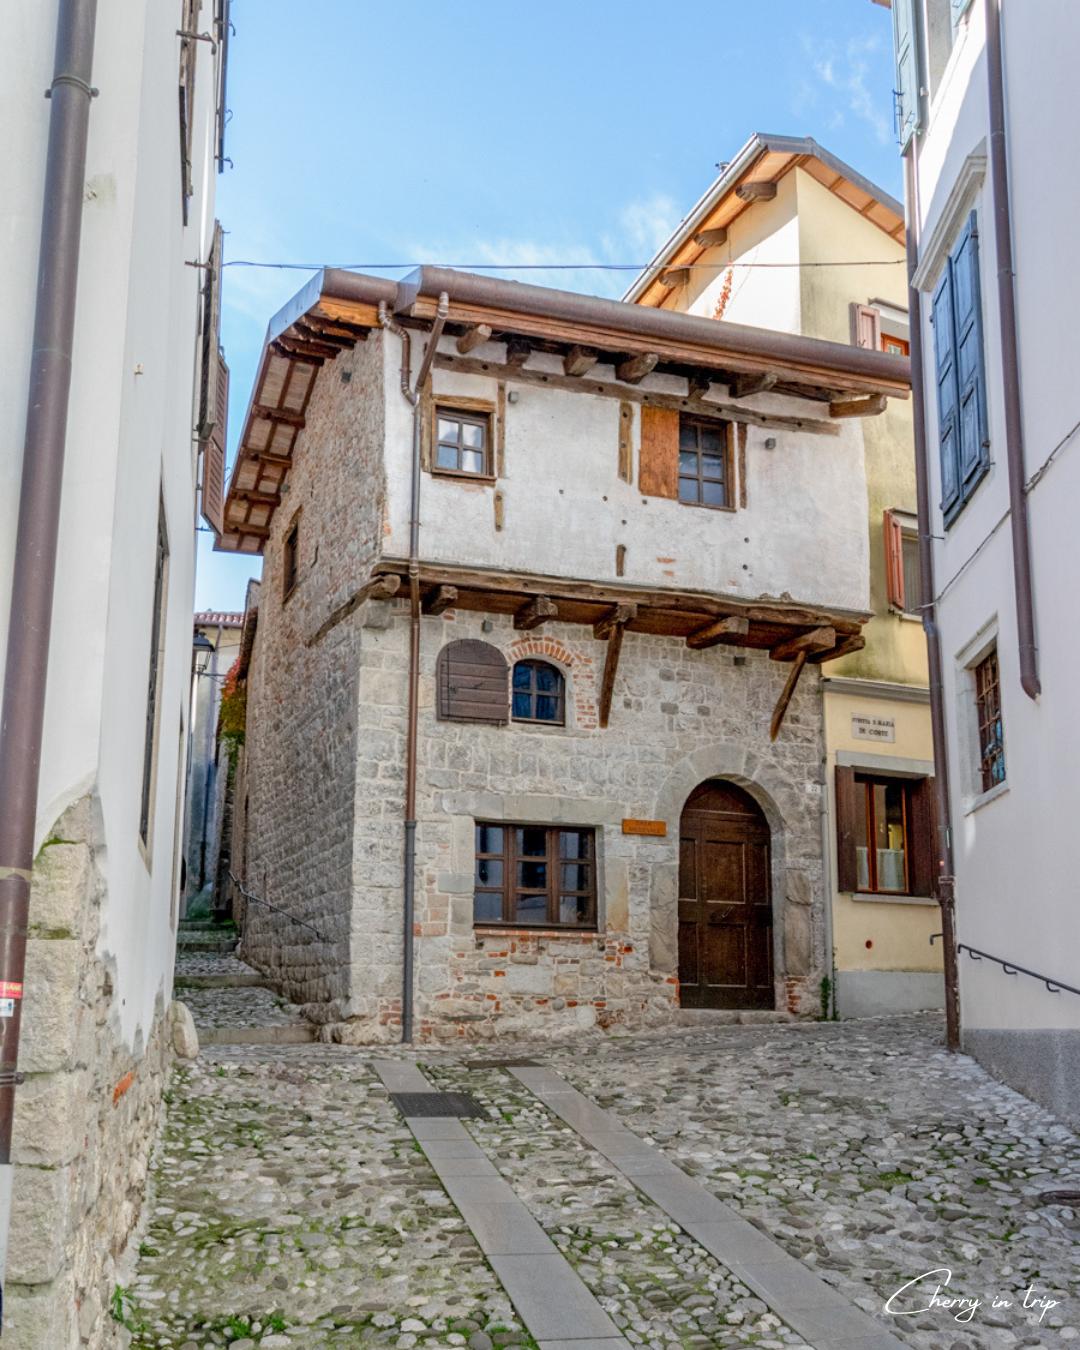 Casa medievale a Cividale del Friuli